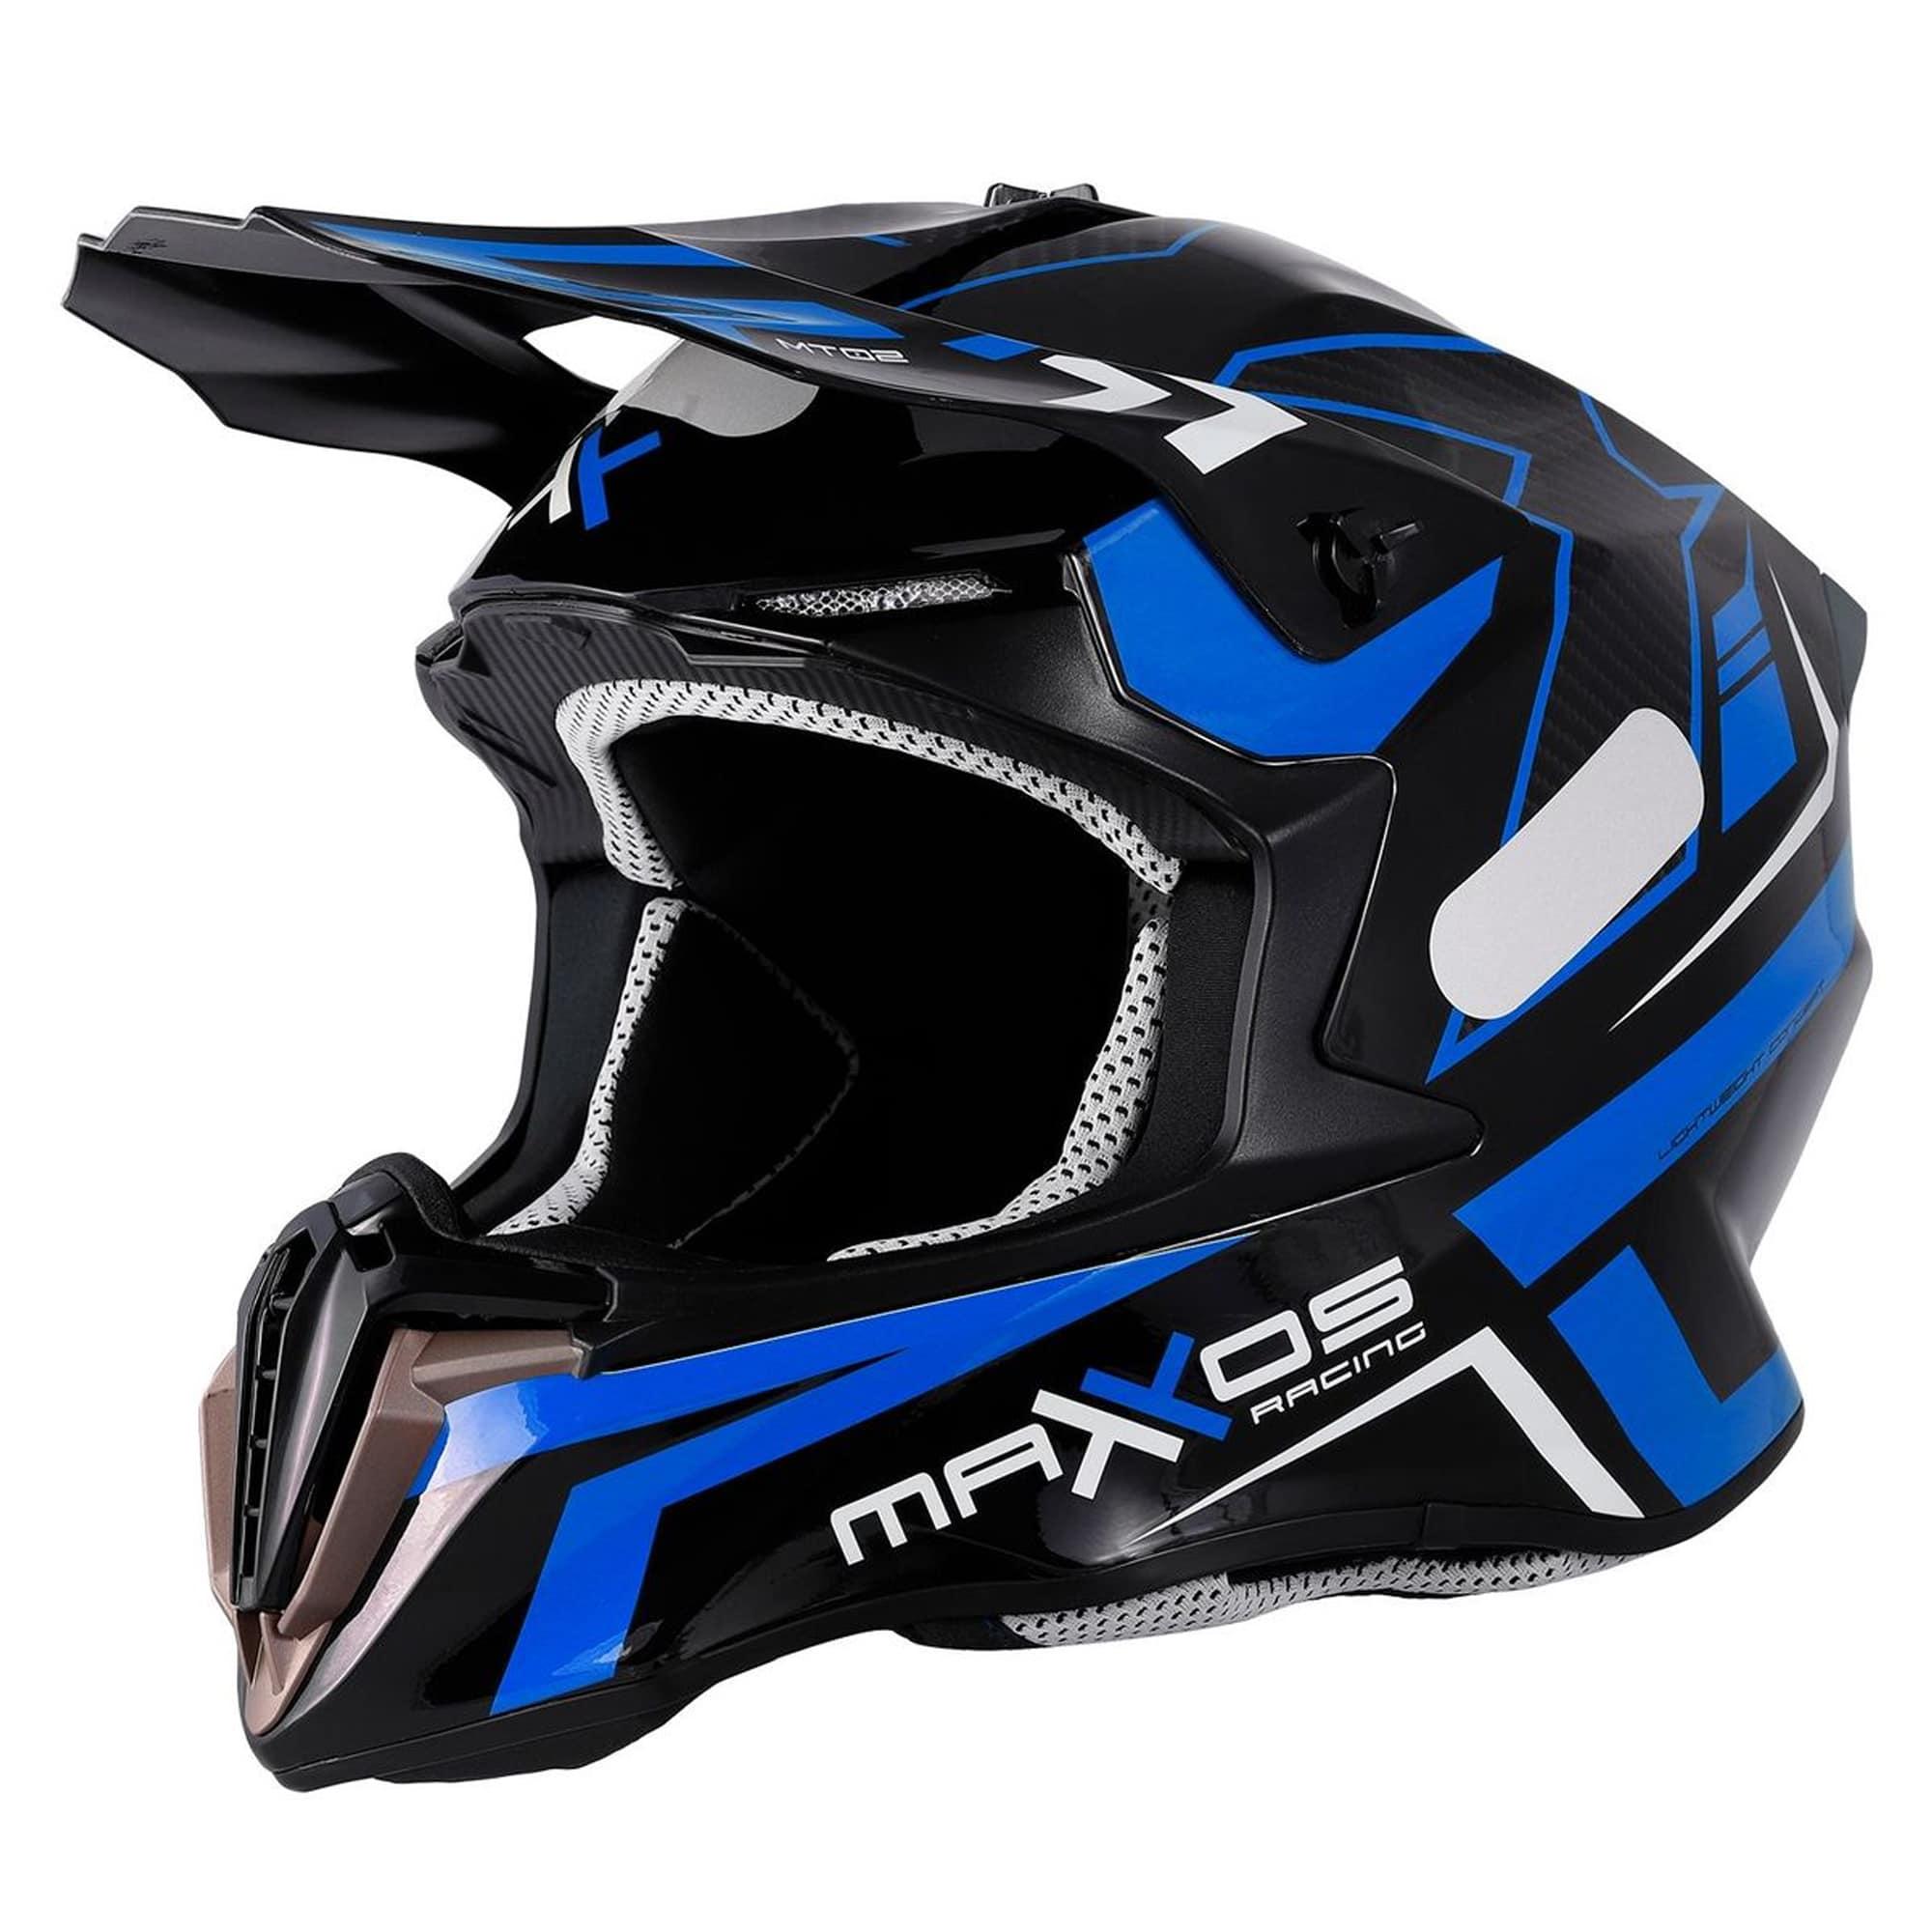 Capacete Mattos Racing Combat MTR02  - HP Race Off Road